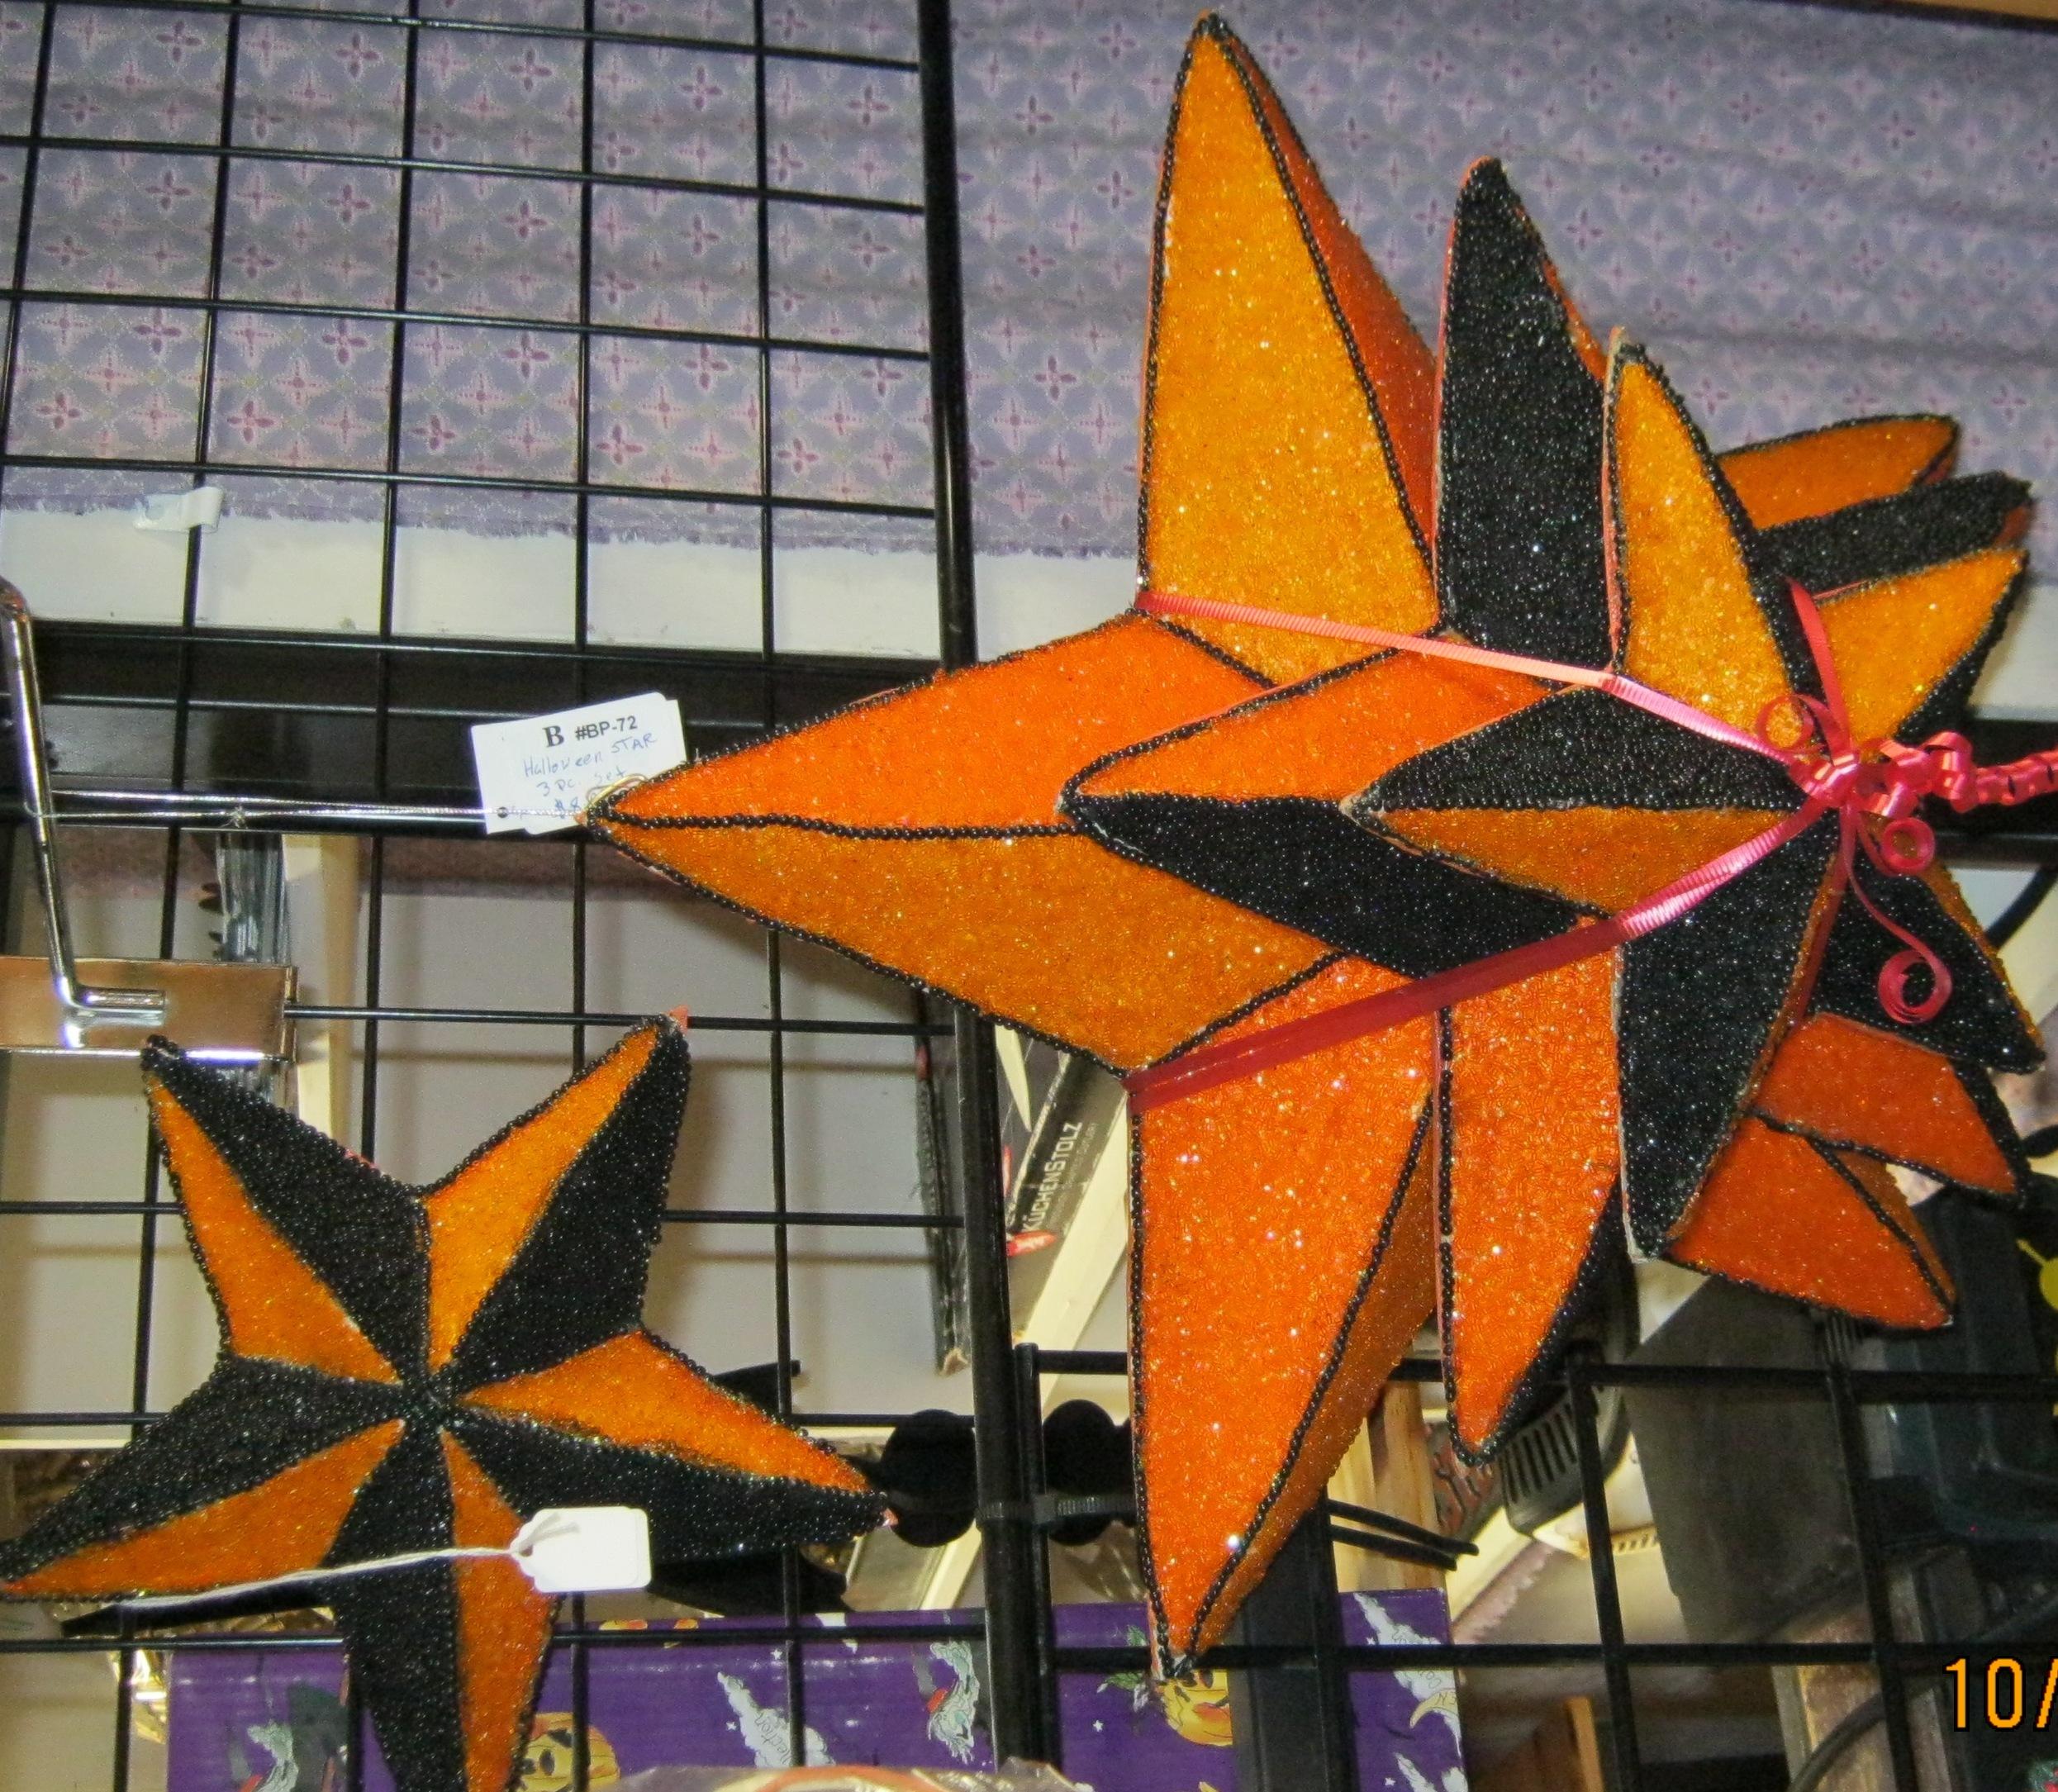 BP-72 Orange Black Stars